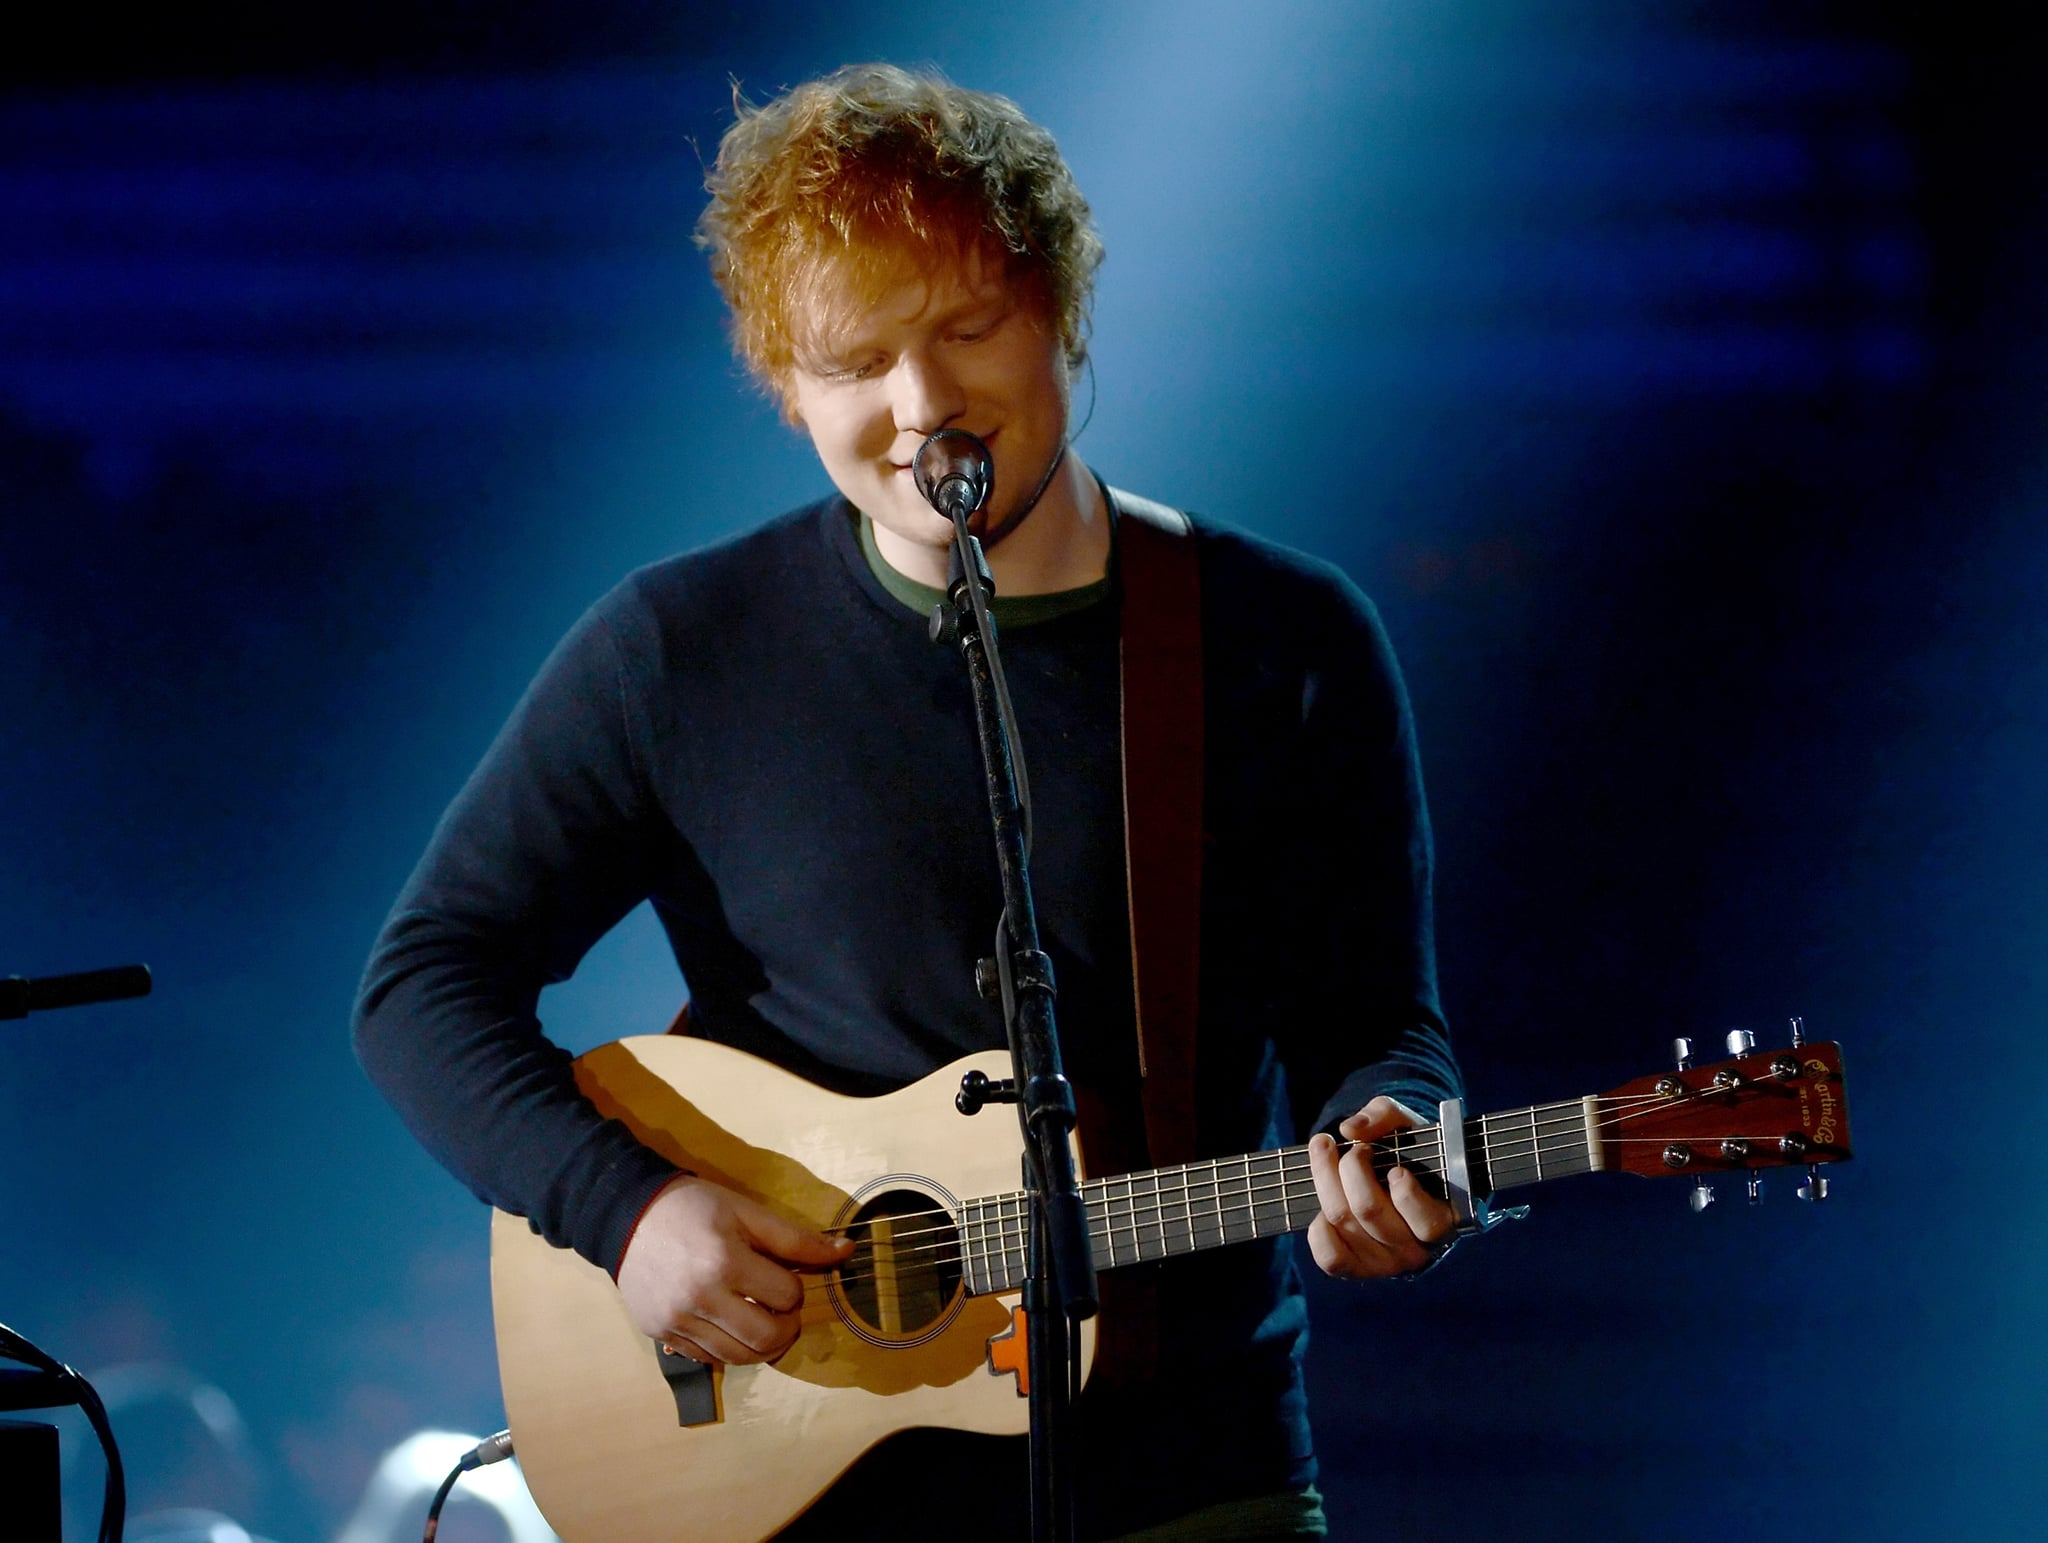 Ed Sheeran played alongside Elton John.